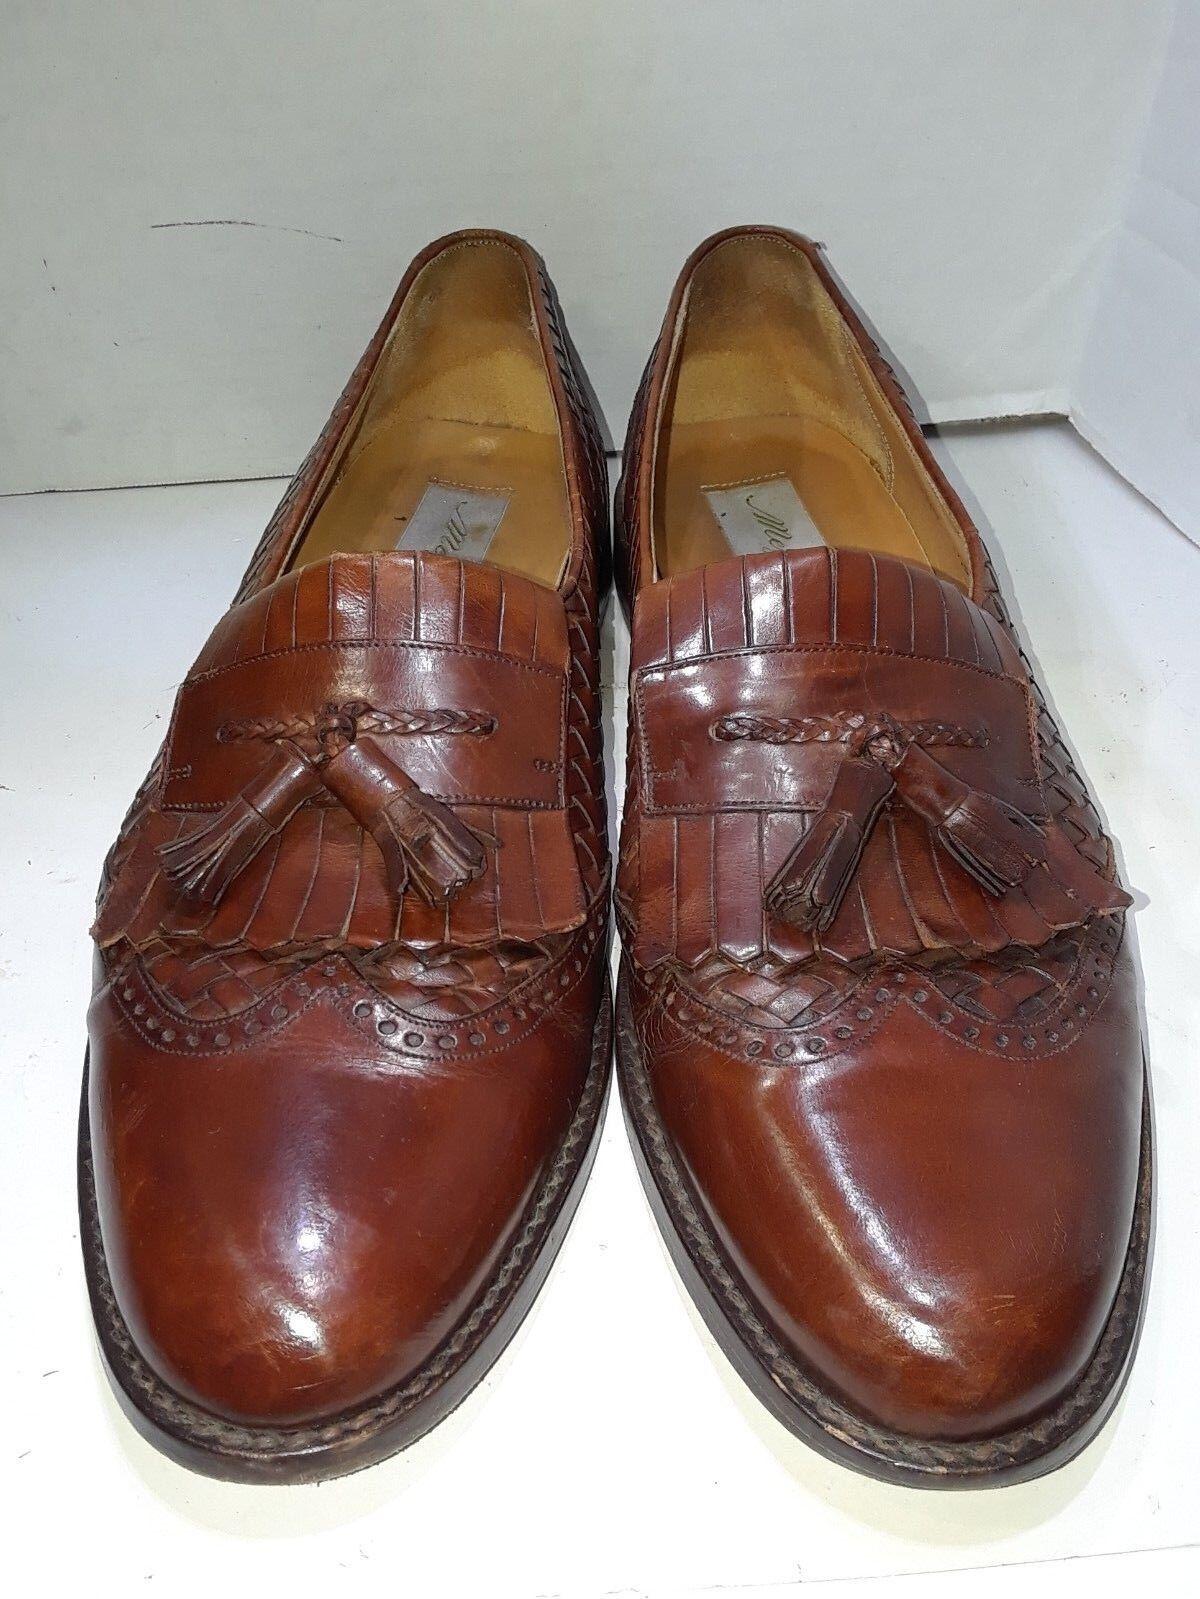 MEZLAN Alicante Braun Leder Woven 11.5 Brogue Tassel Loafers Schuhes 11.5 Woven B 01ac1b